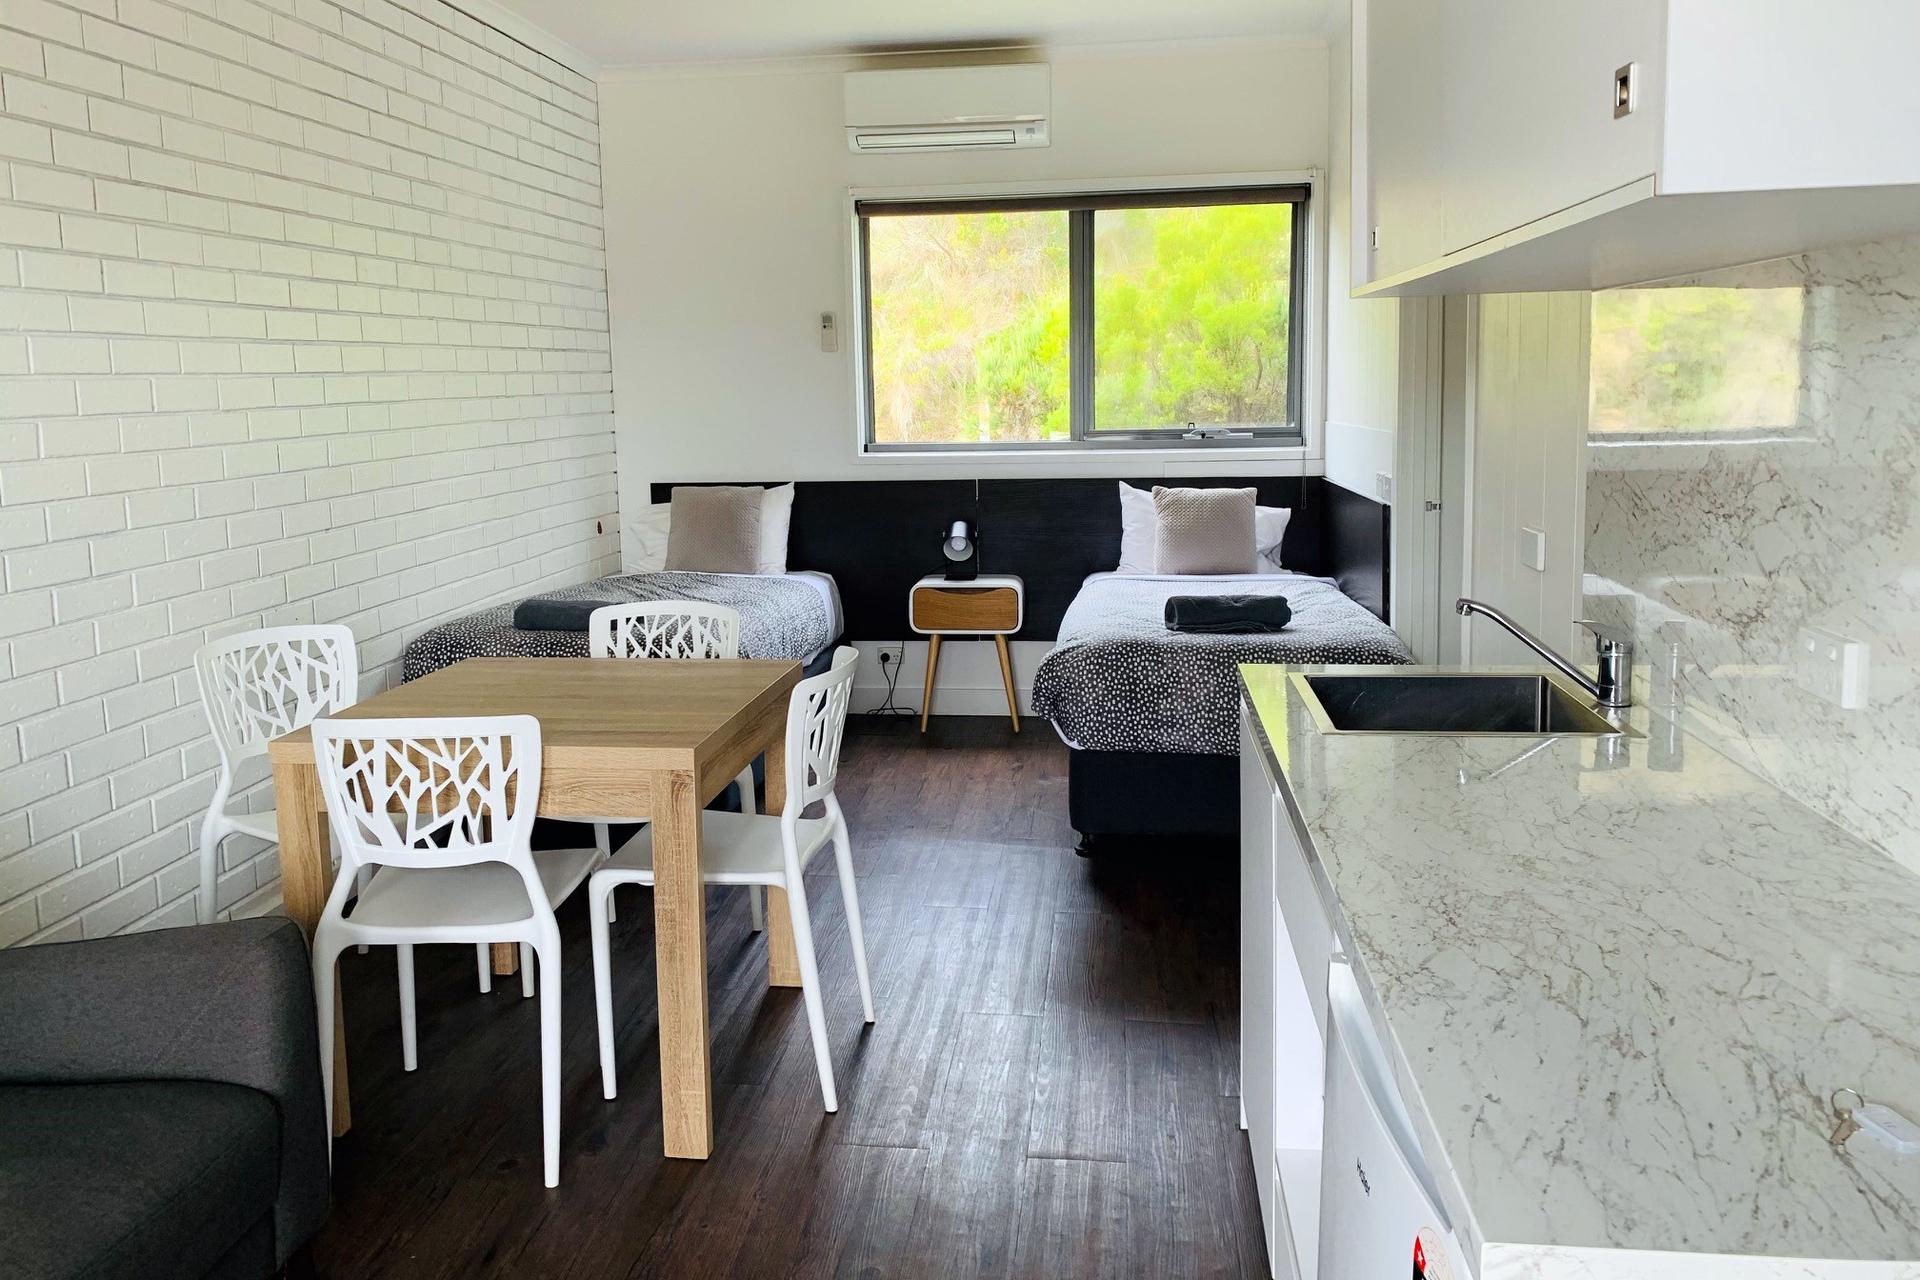 o - Southern Ocean Motor Inn